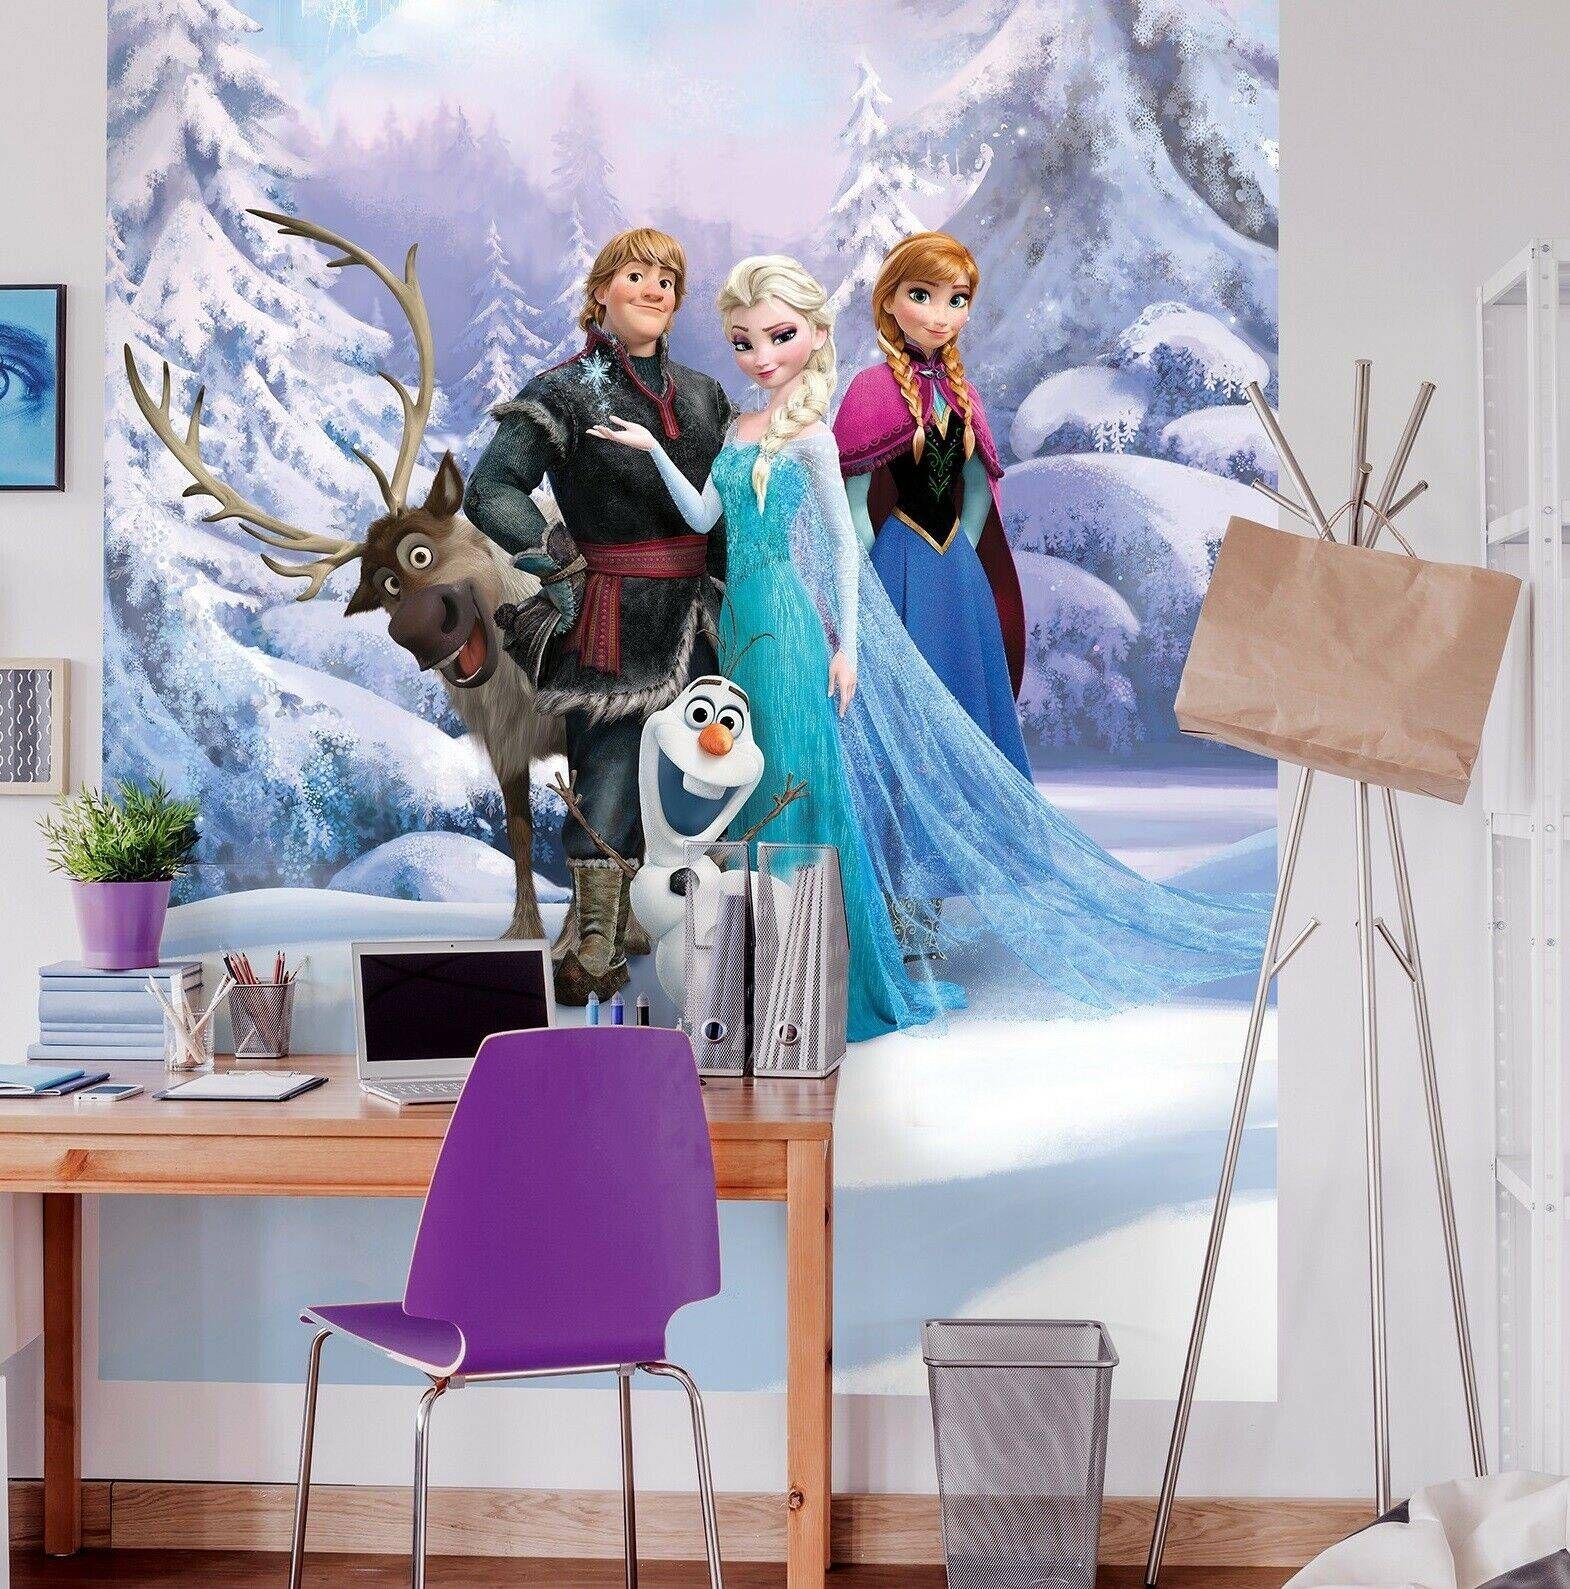 Elsa Frozen 2 Bedroom Decorating Ideas Buildingdesign Homedesign Architecturehomedesign Housedesignidea Priv Bedroom Decor Photo Decor Mural Wallpaper